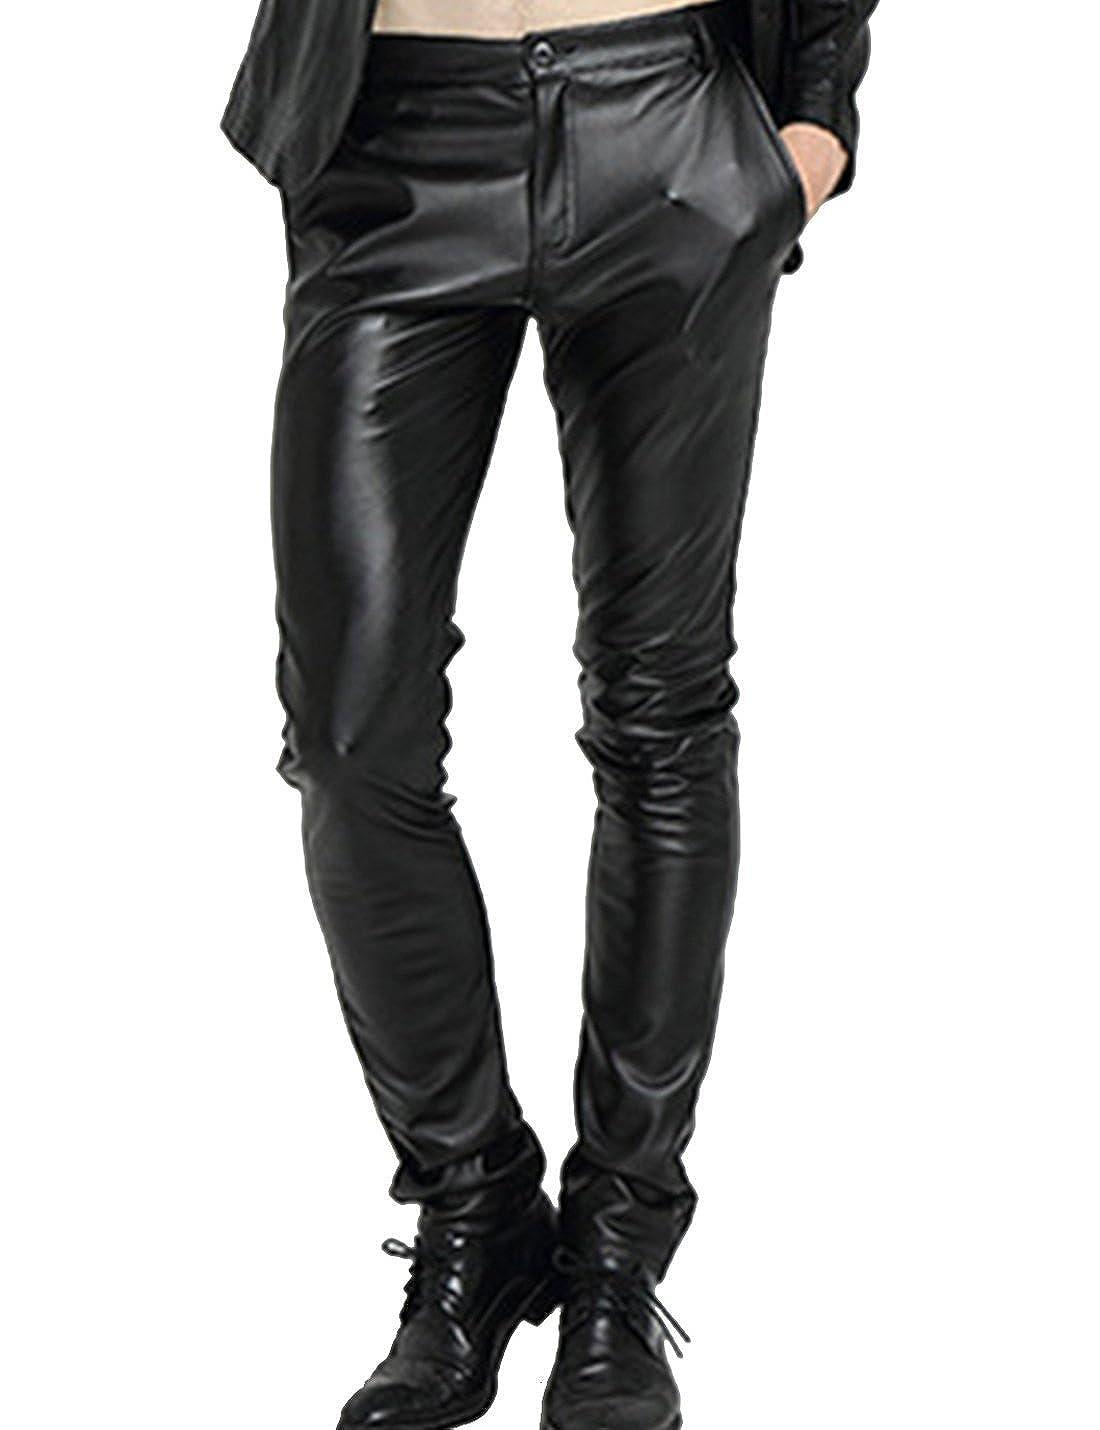 fcf3b1498c8d Yeokou Men s Punk Skinny Slim-Tapered Moto Straight Leg PU Faux Leather  Pants at Amazon Men s Clothing store